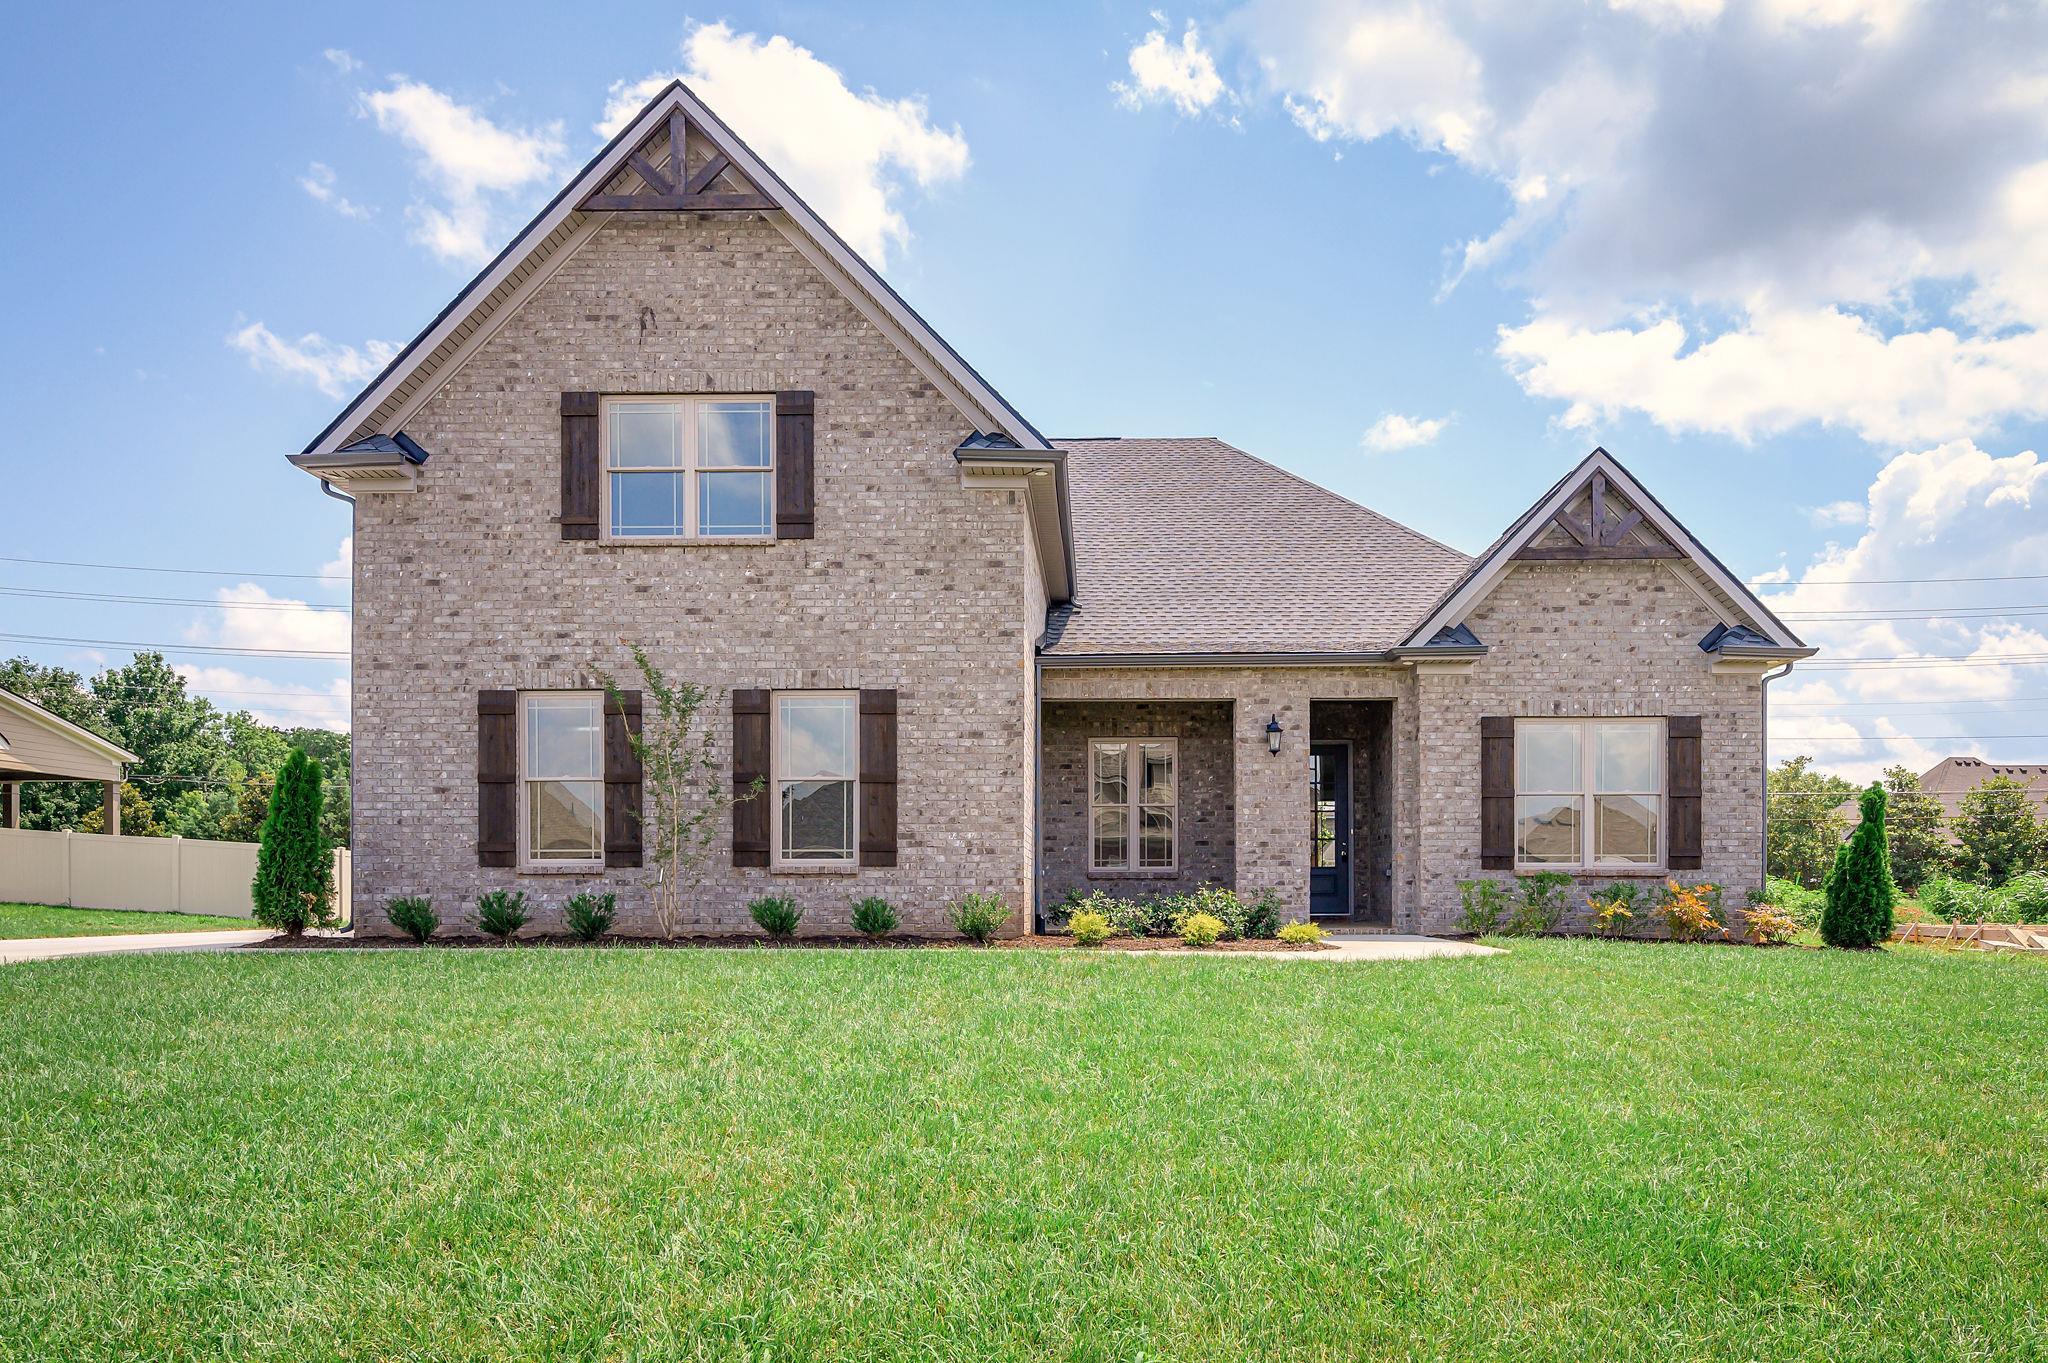 2822 Bertram Ct, Murfreesboro, TN 37129 - Murfreesboro, TN real estate listing